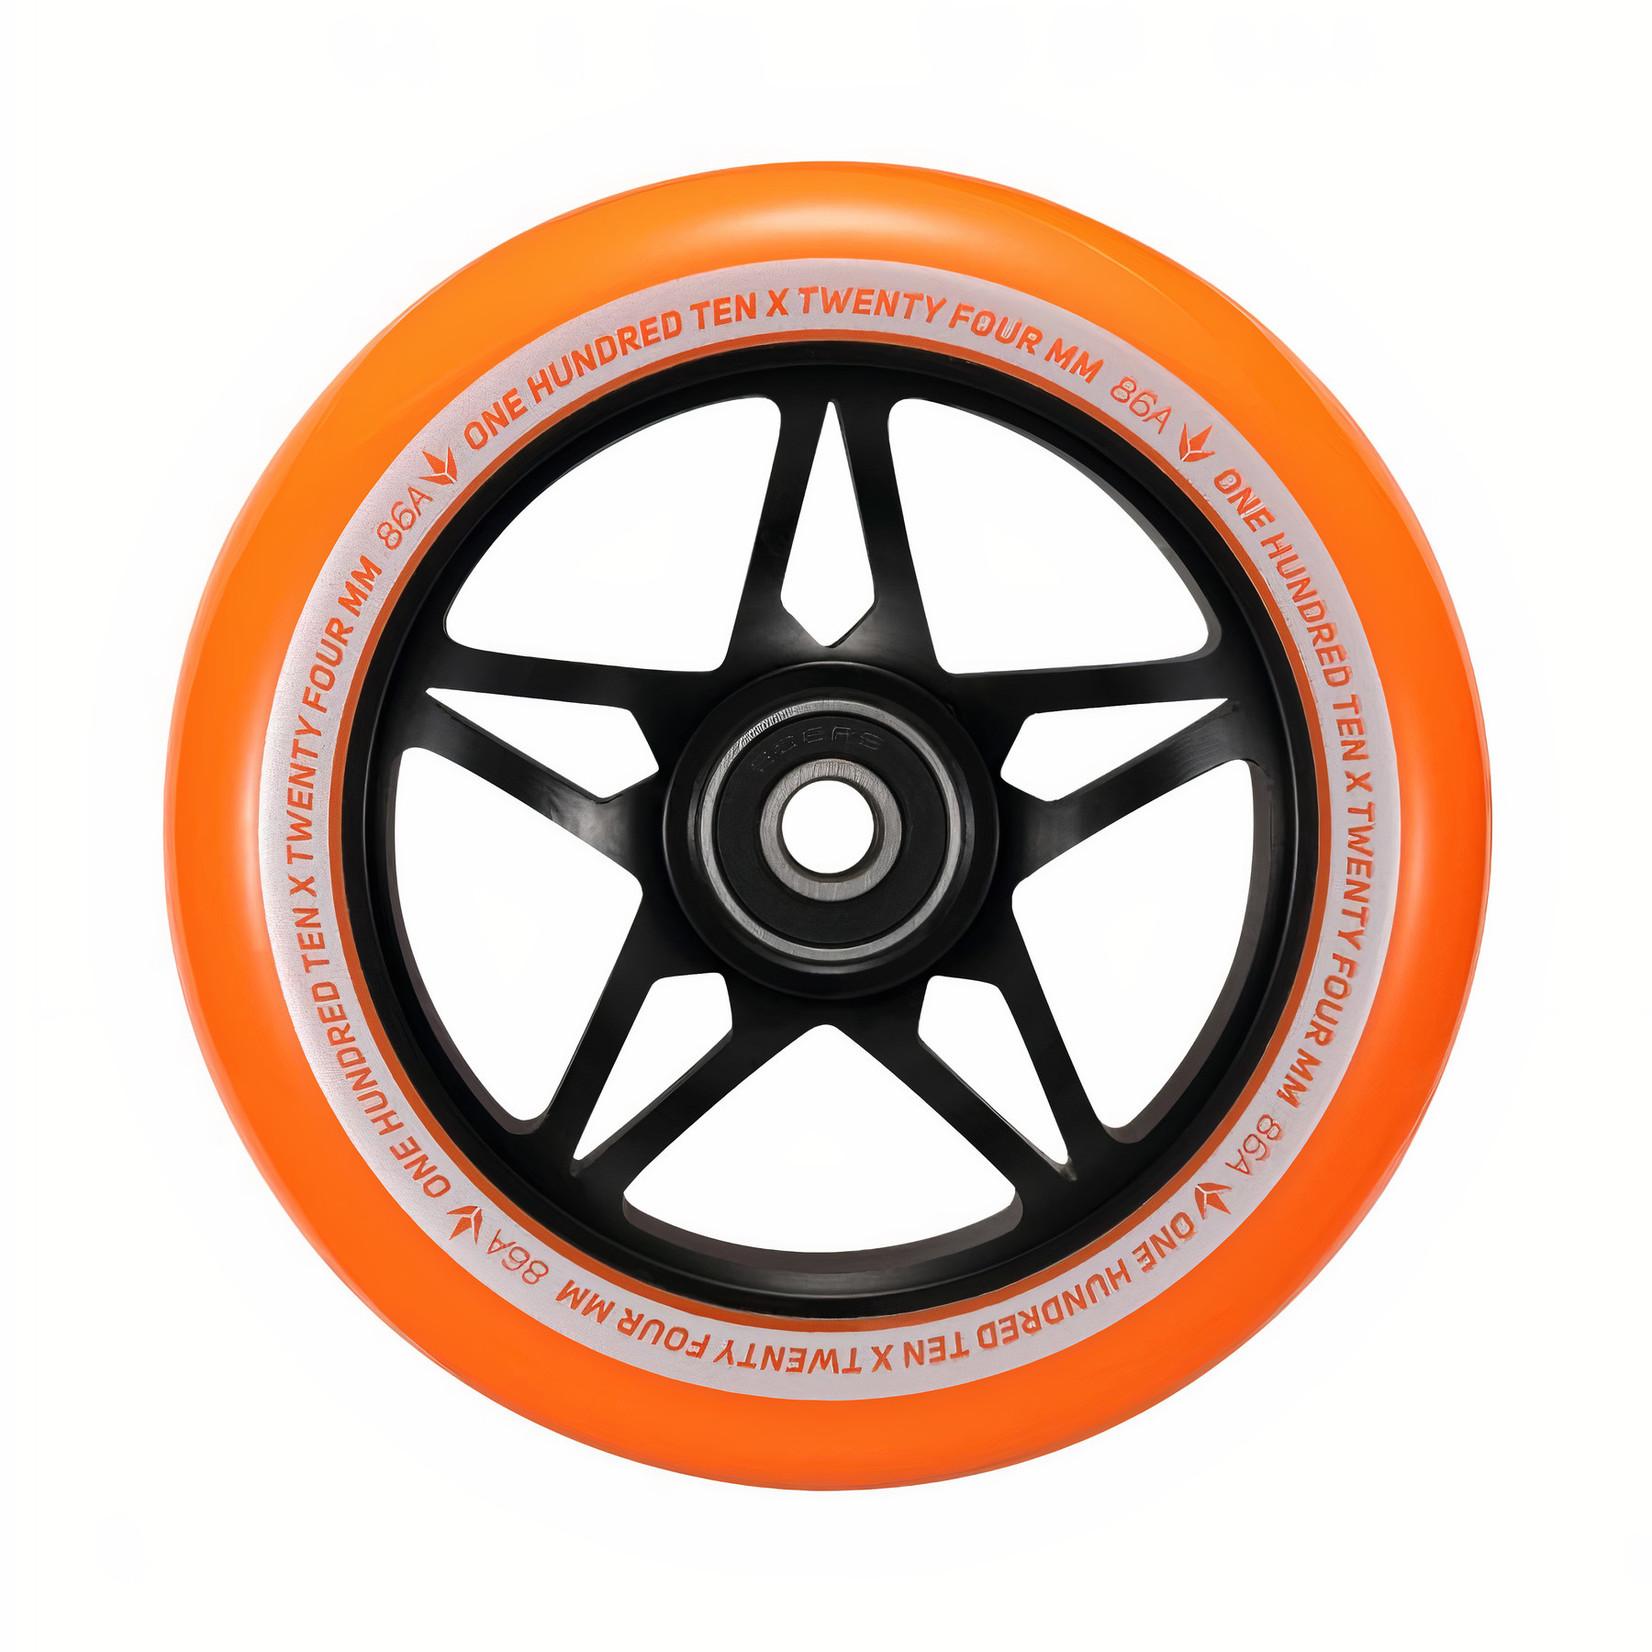 Envy Envy - 110mm S3 Wheel SINGLE - Black / Orange